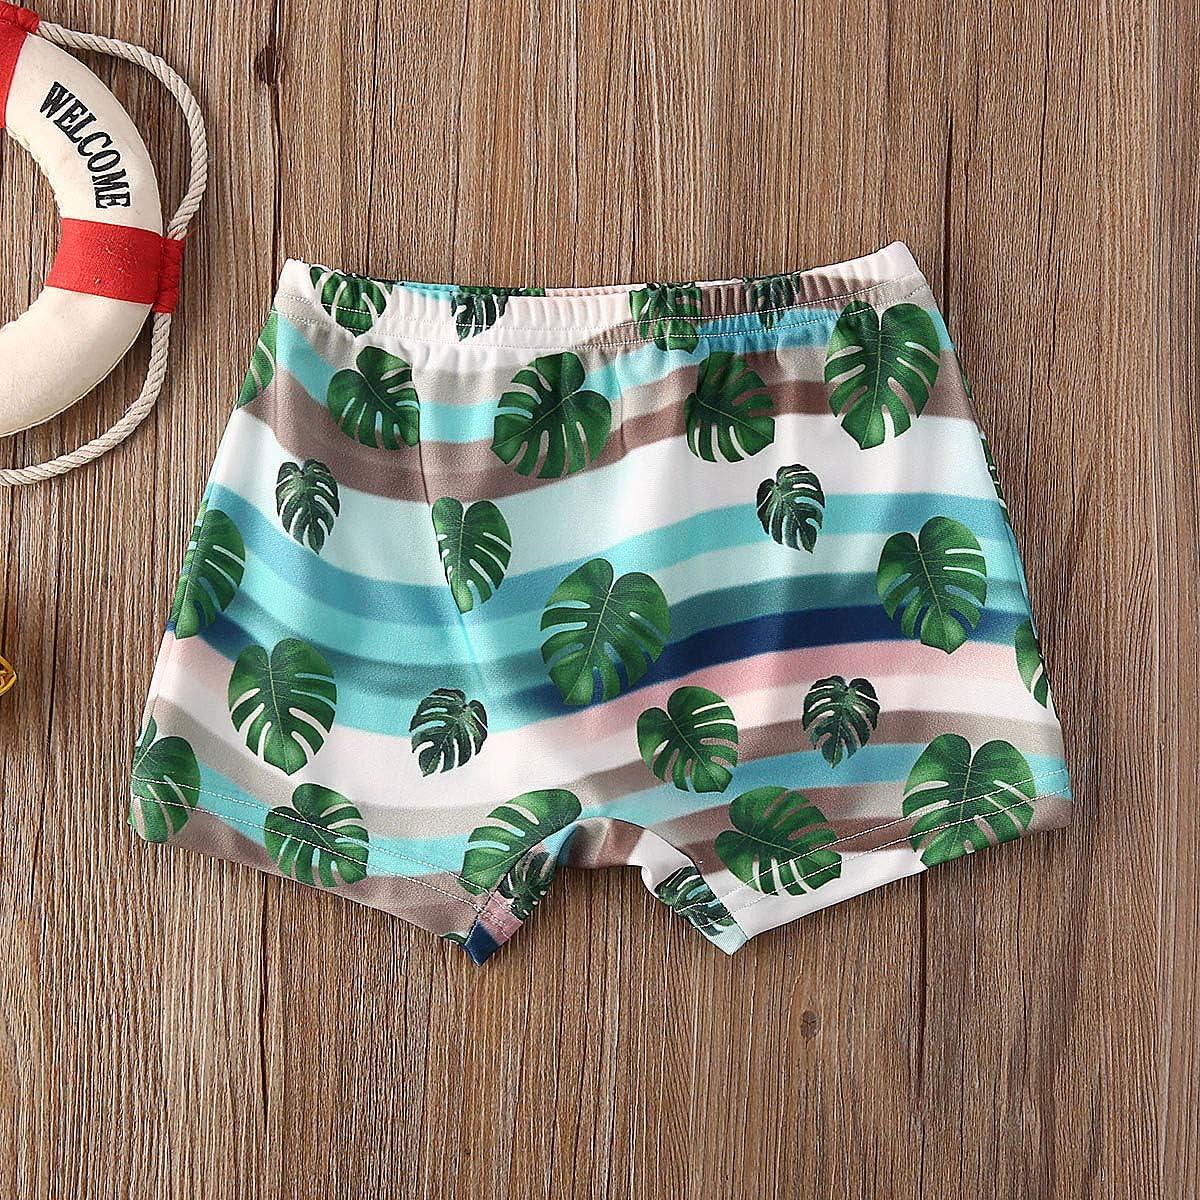 Toddler Baby Boys Short Pants Summer Shorts Infant Bottom with Big Pocket